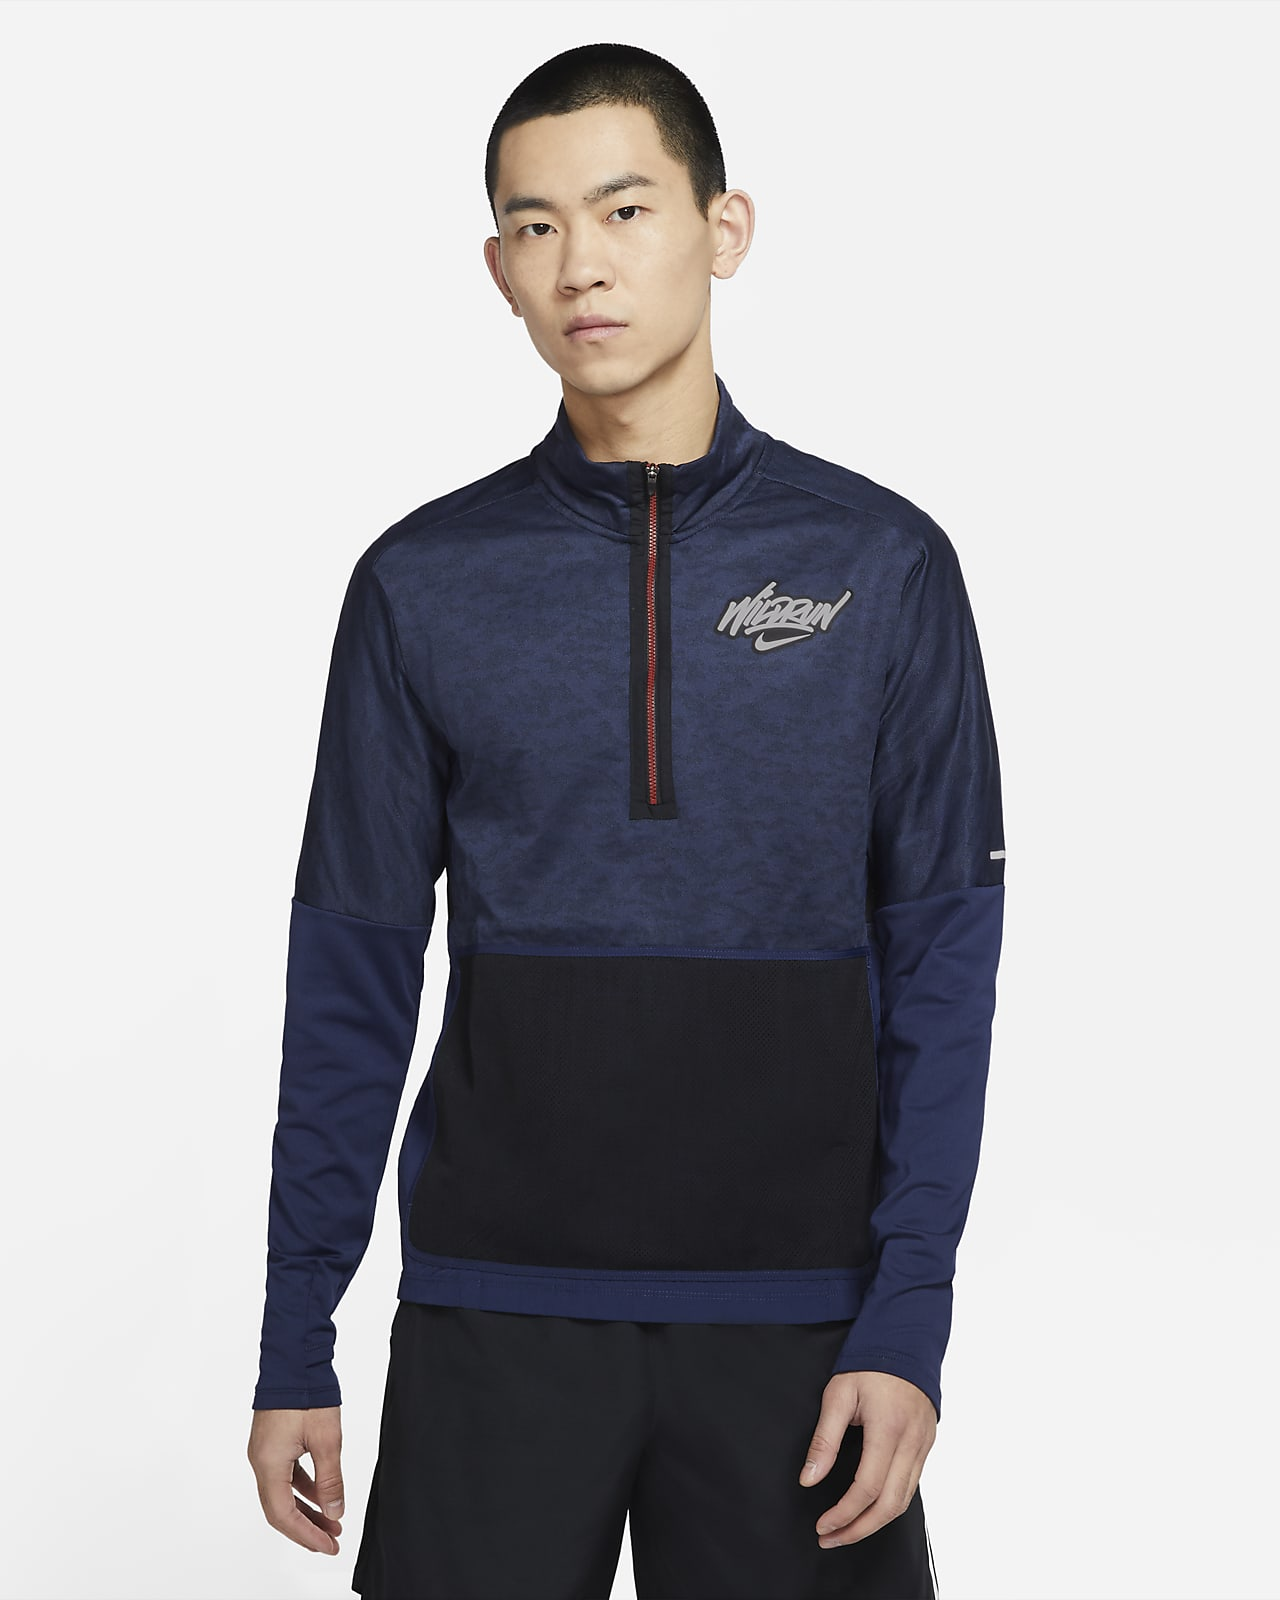 Nike Element Wild Run 男子印花跑步上衣